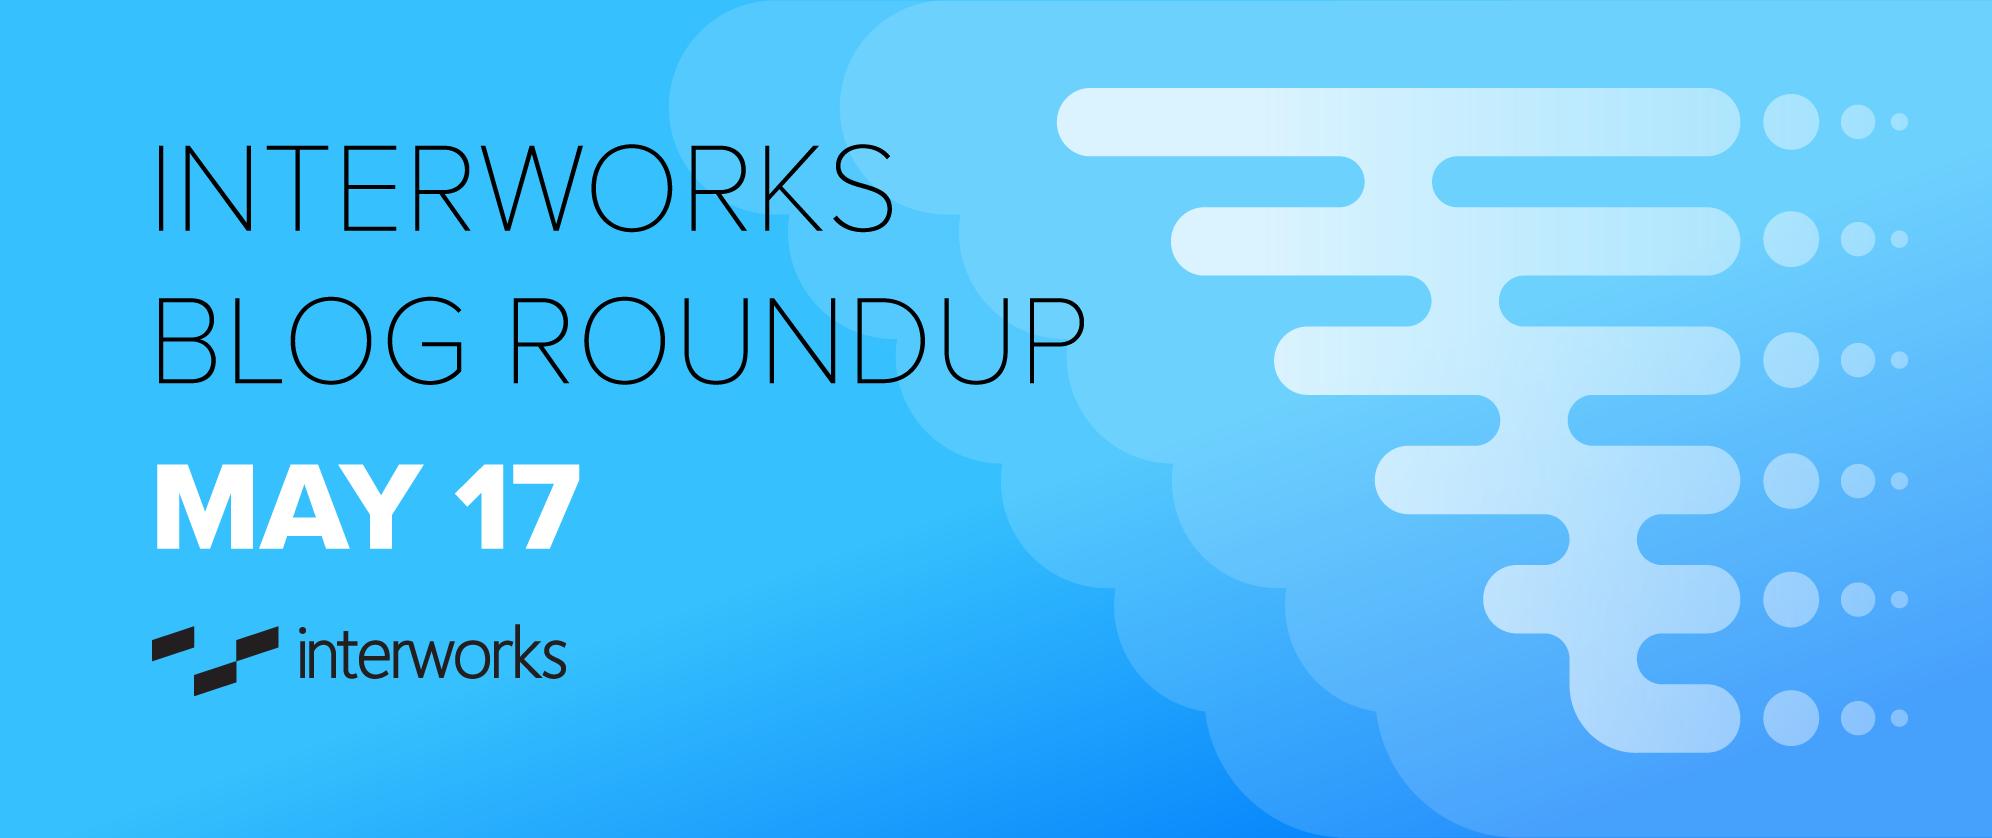 Interworks Blog Roundup